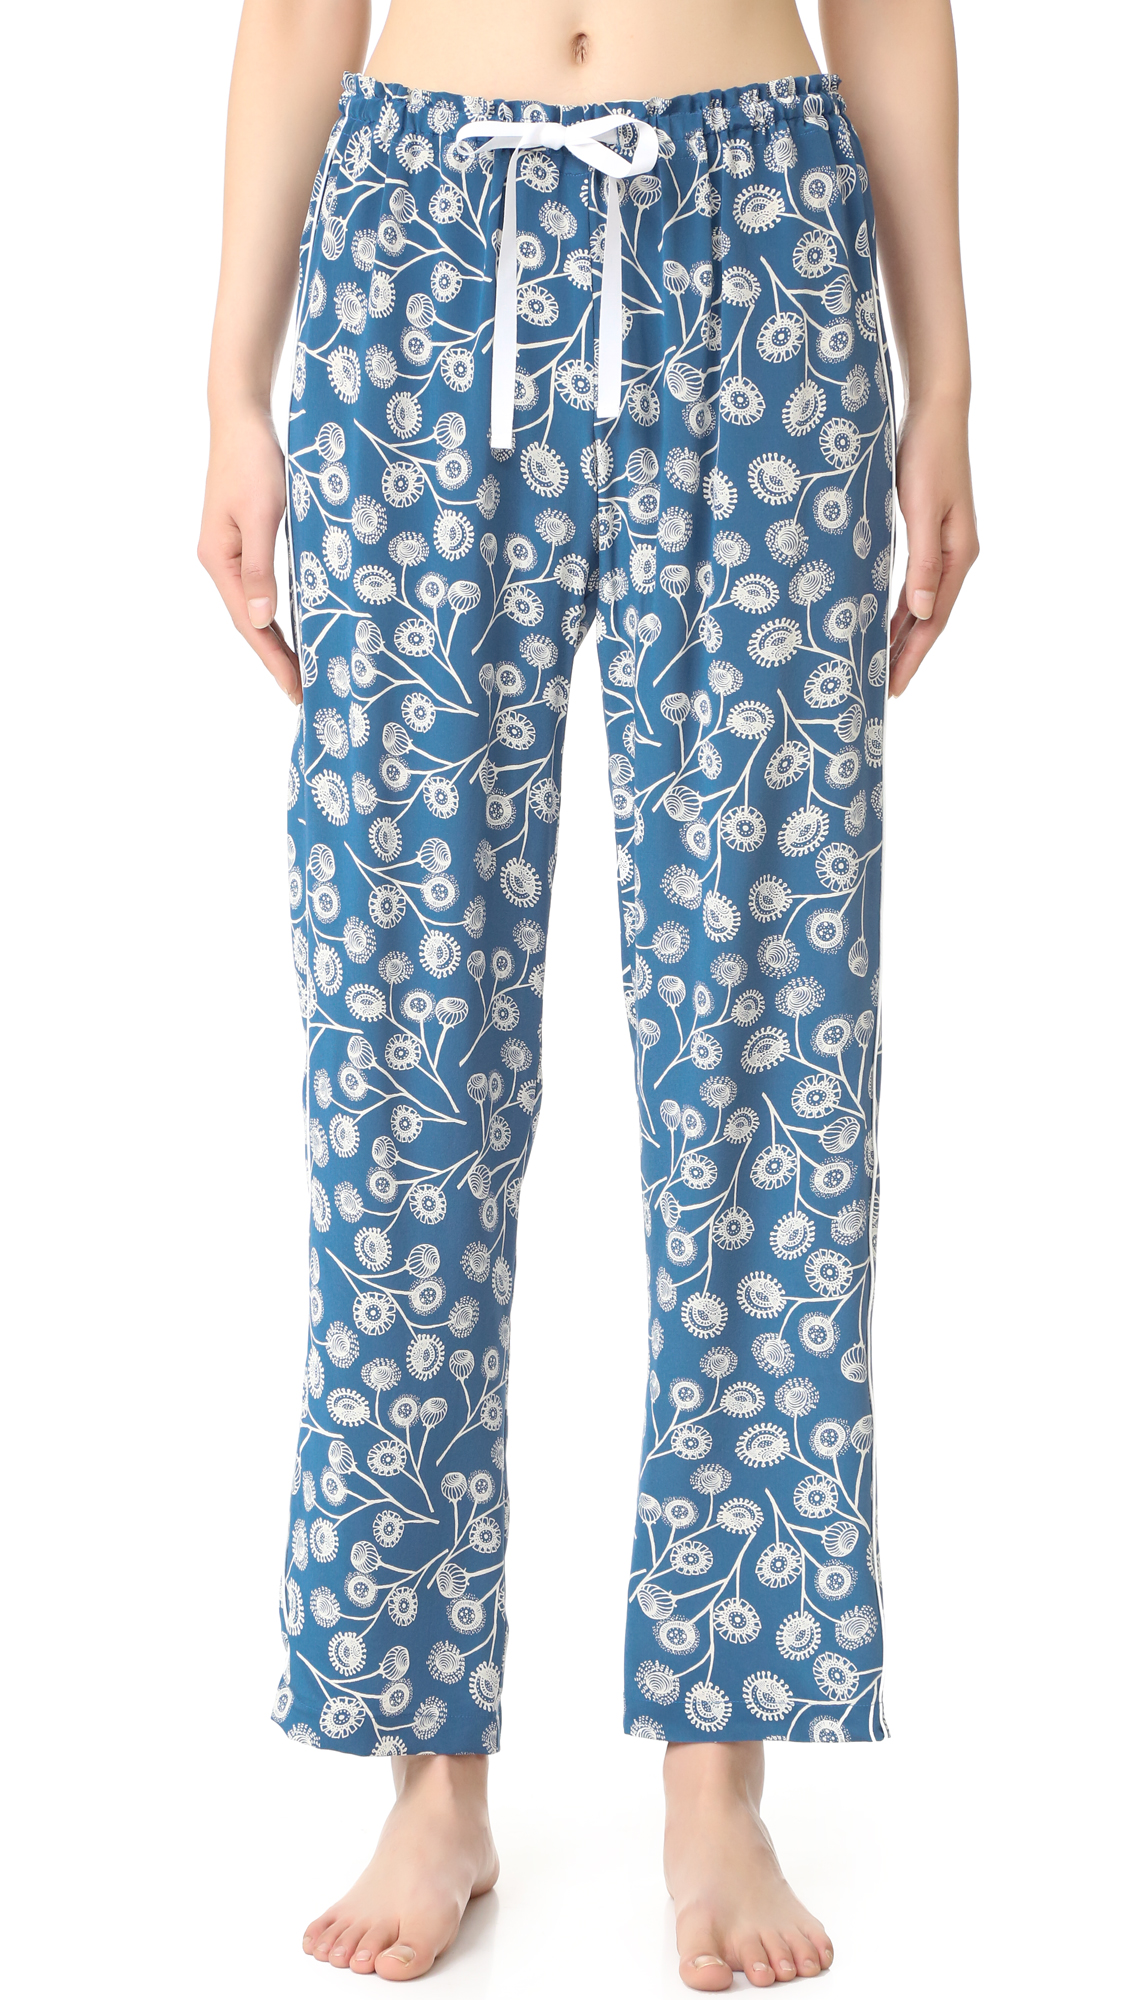 Alessandra Mackenzie Allison Pj Pants - Blue/White Dandelion at Shopbop